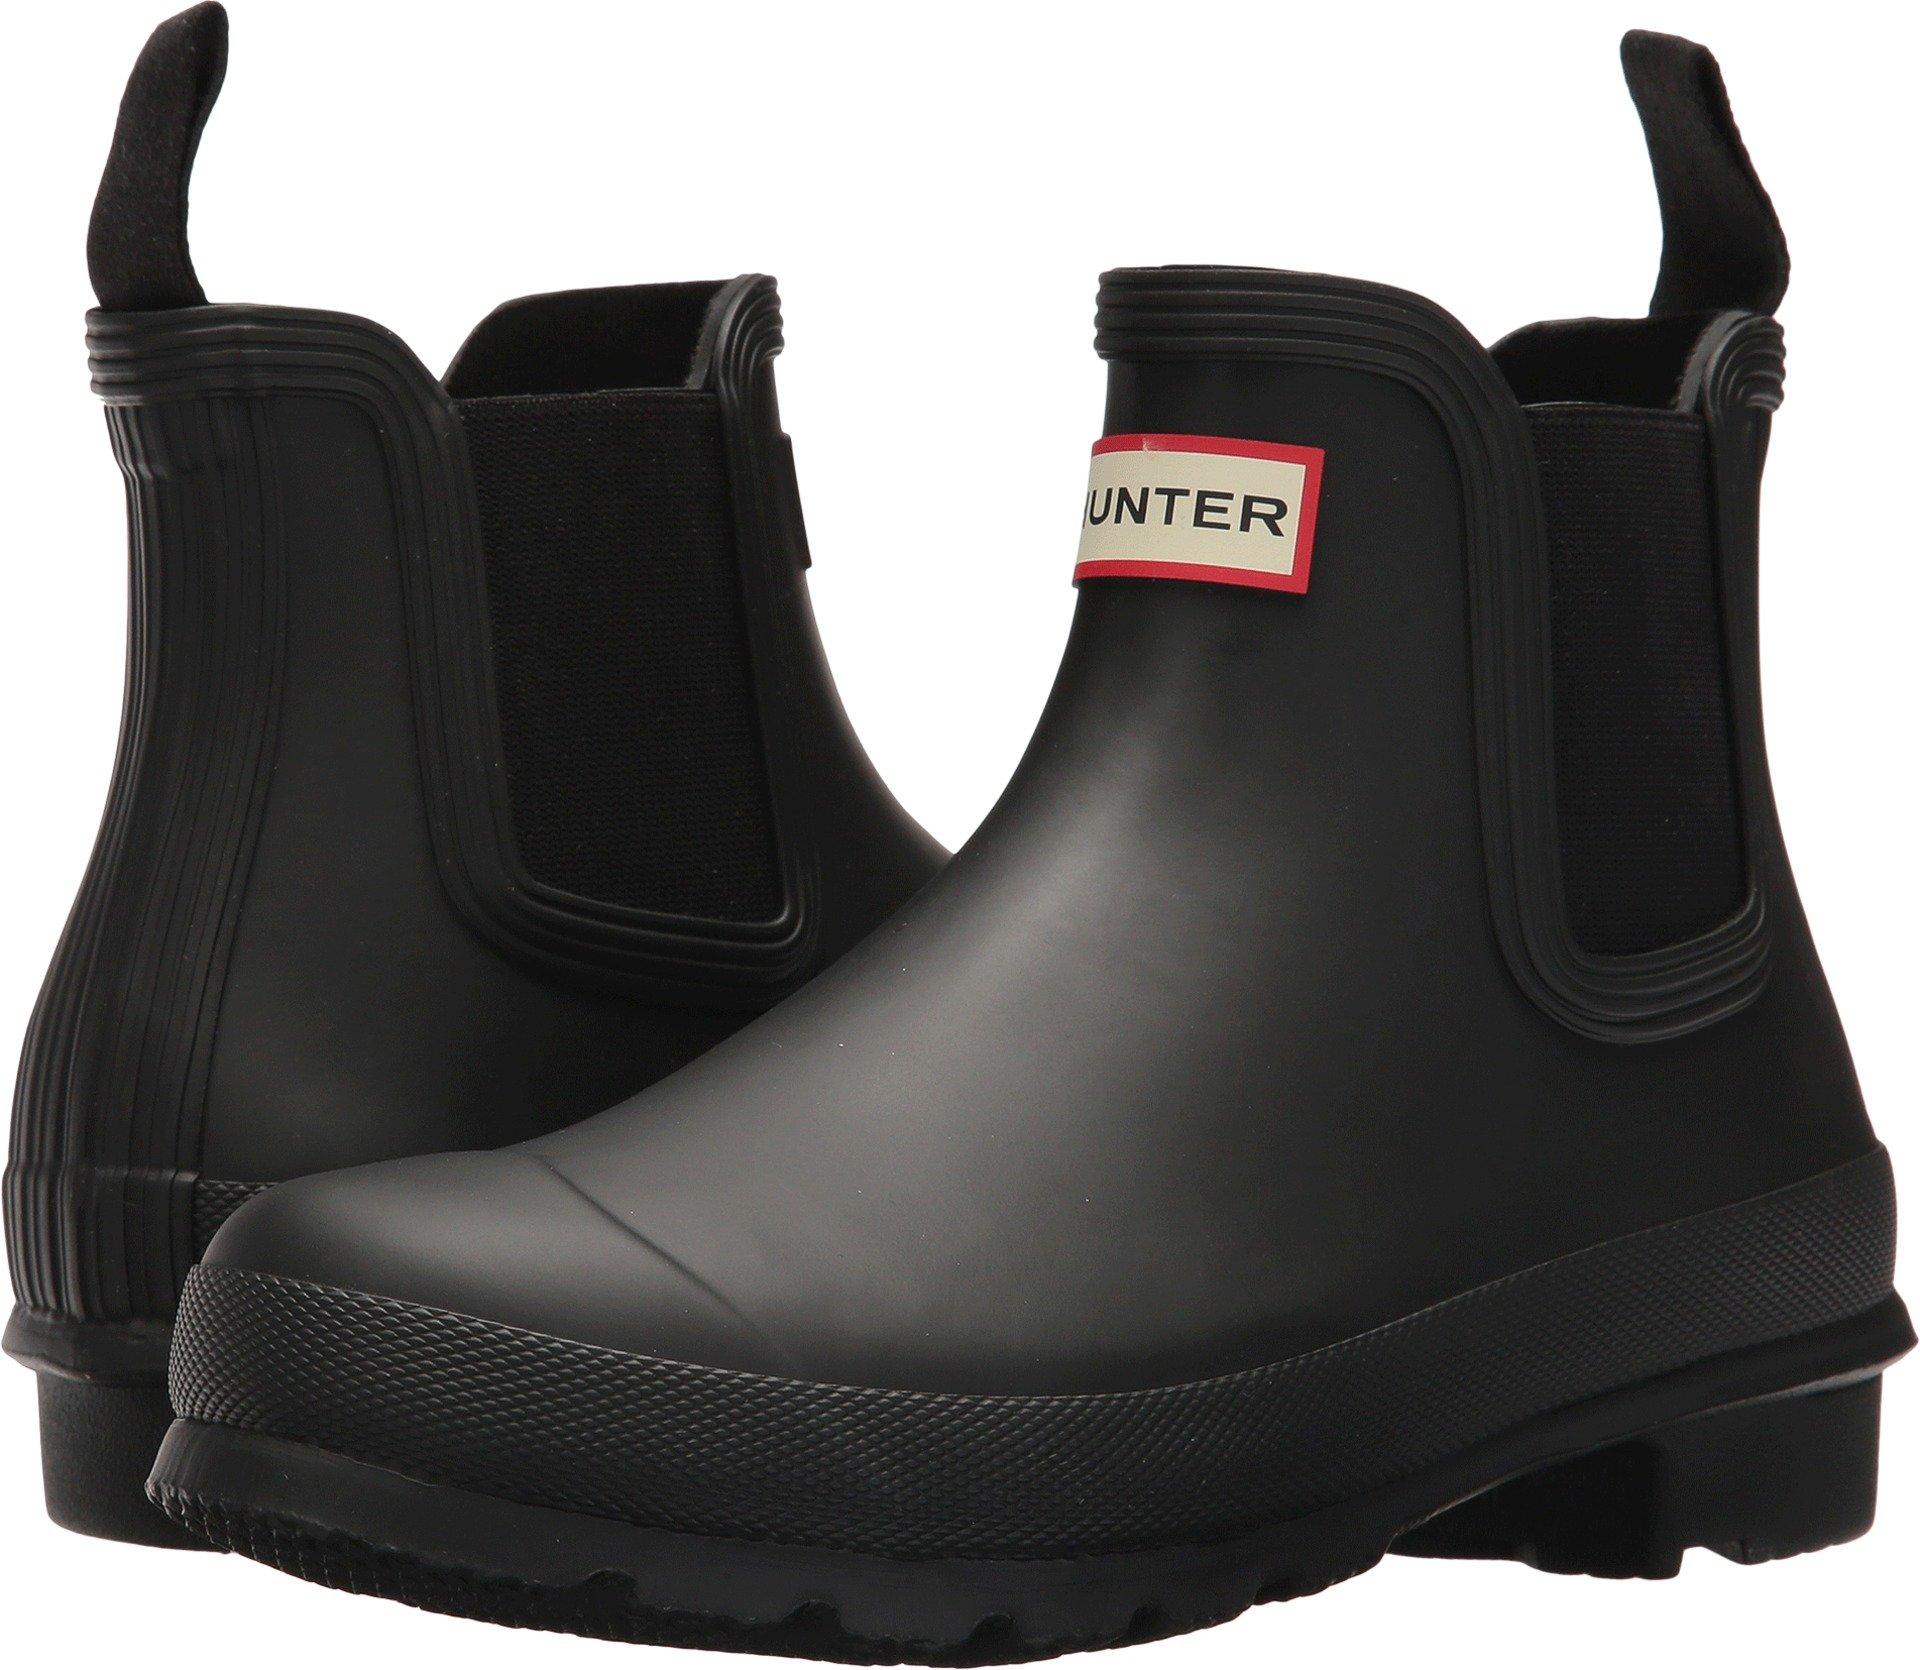 Hunter Boots Women's Original Chelsea Rain Boot Black 7 M US